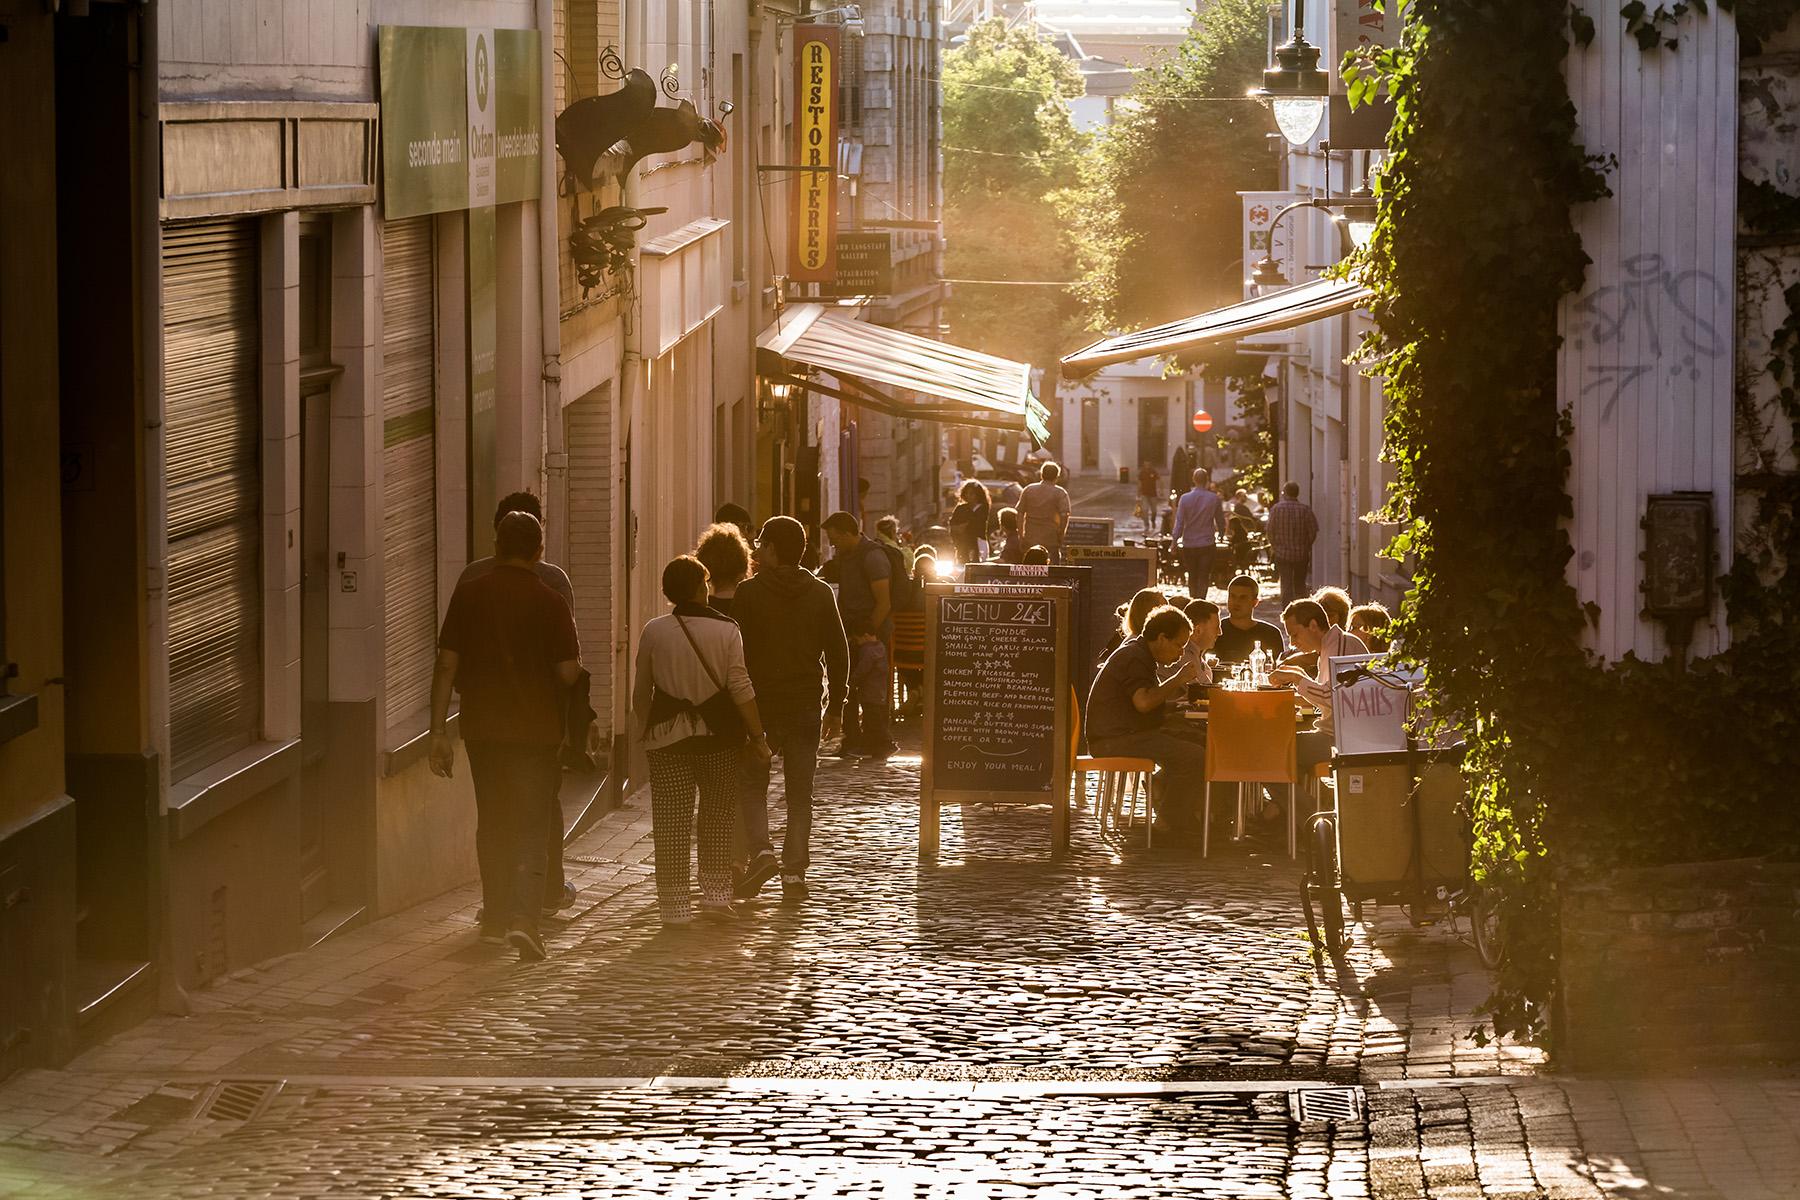 A sunny street in the Marolles neighborhood